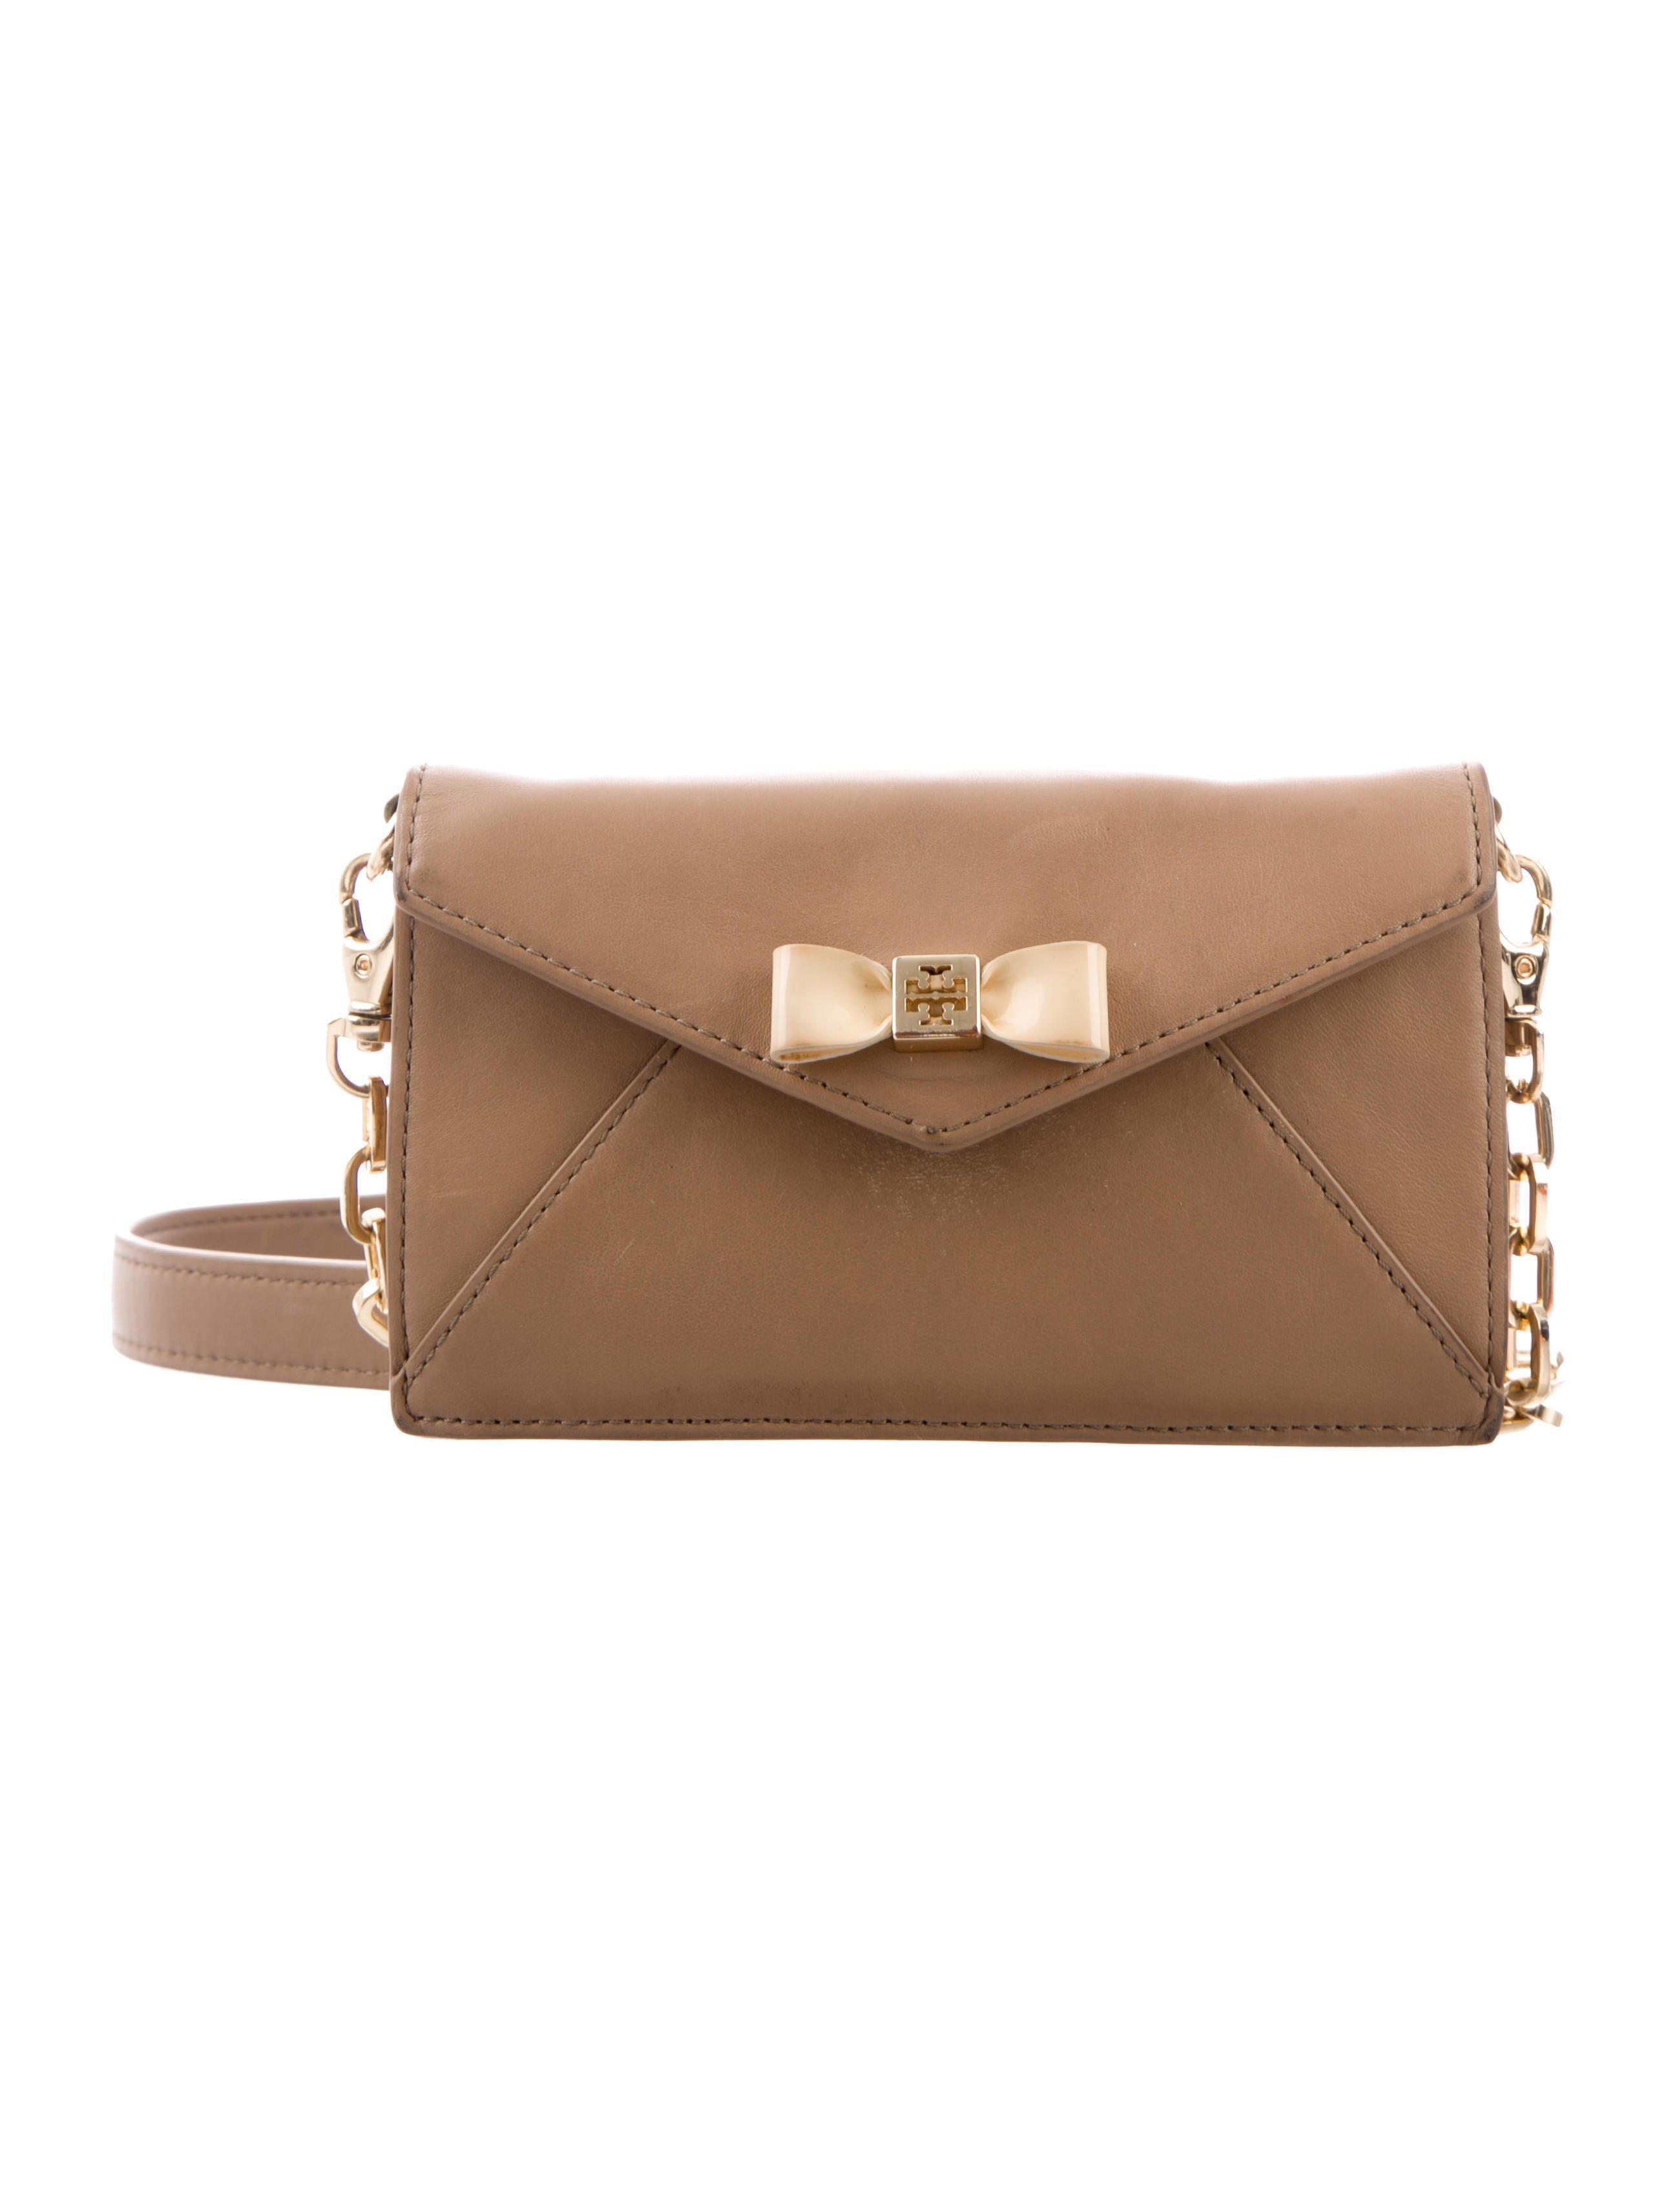 34a4f971347 Lyst - Tory Burch Wallet On Chain Crossbody Bag Beige in Metallic